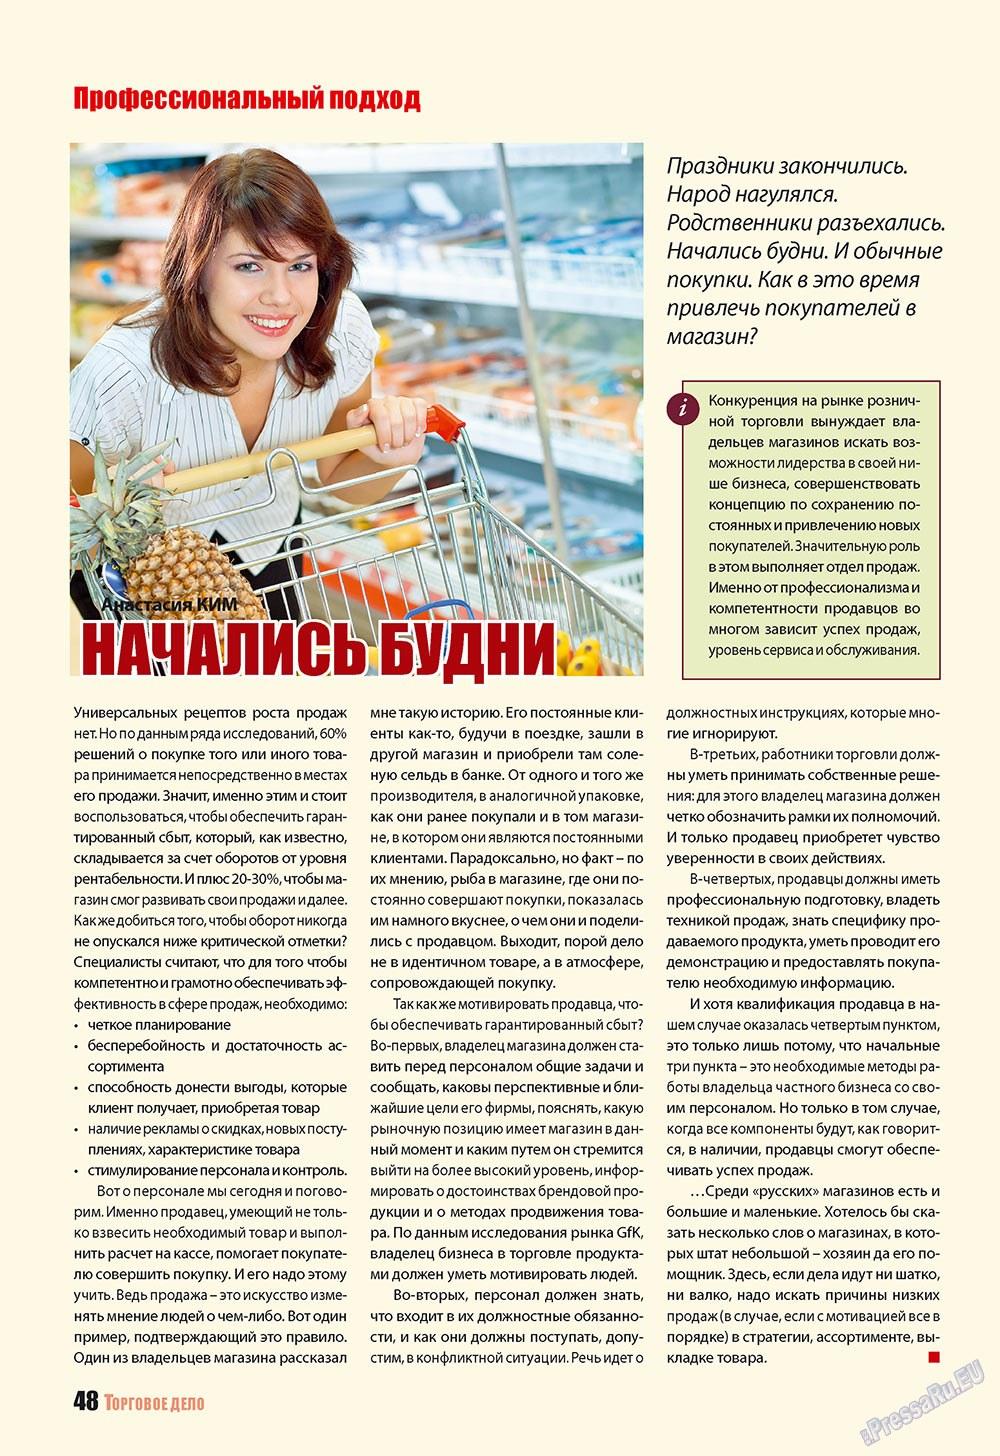 Бизнес (журнал). 2010 год, номер 1, стр. 48